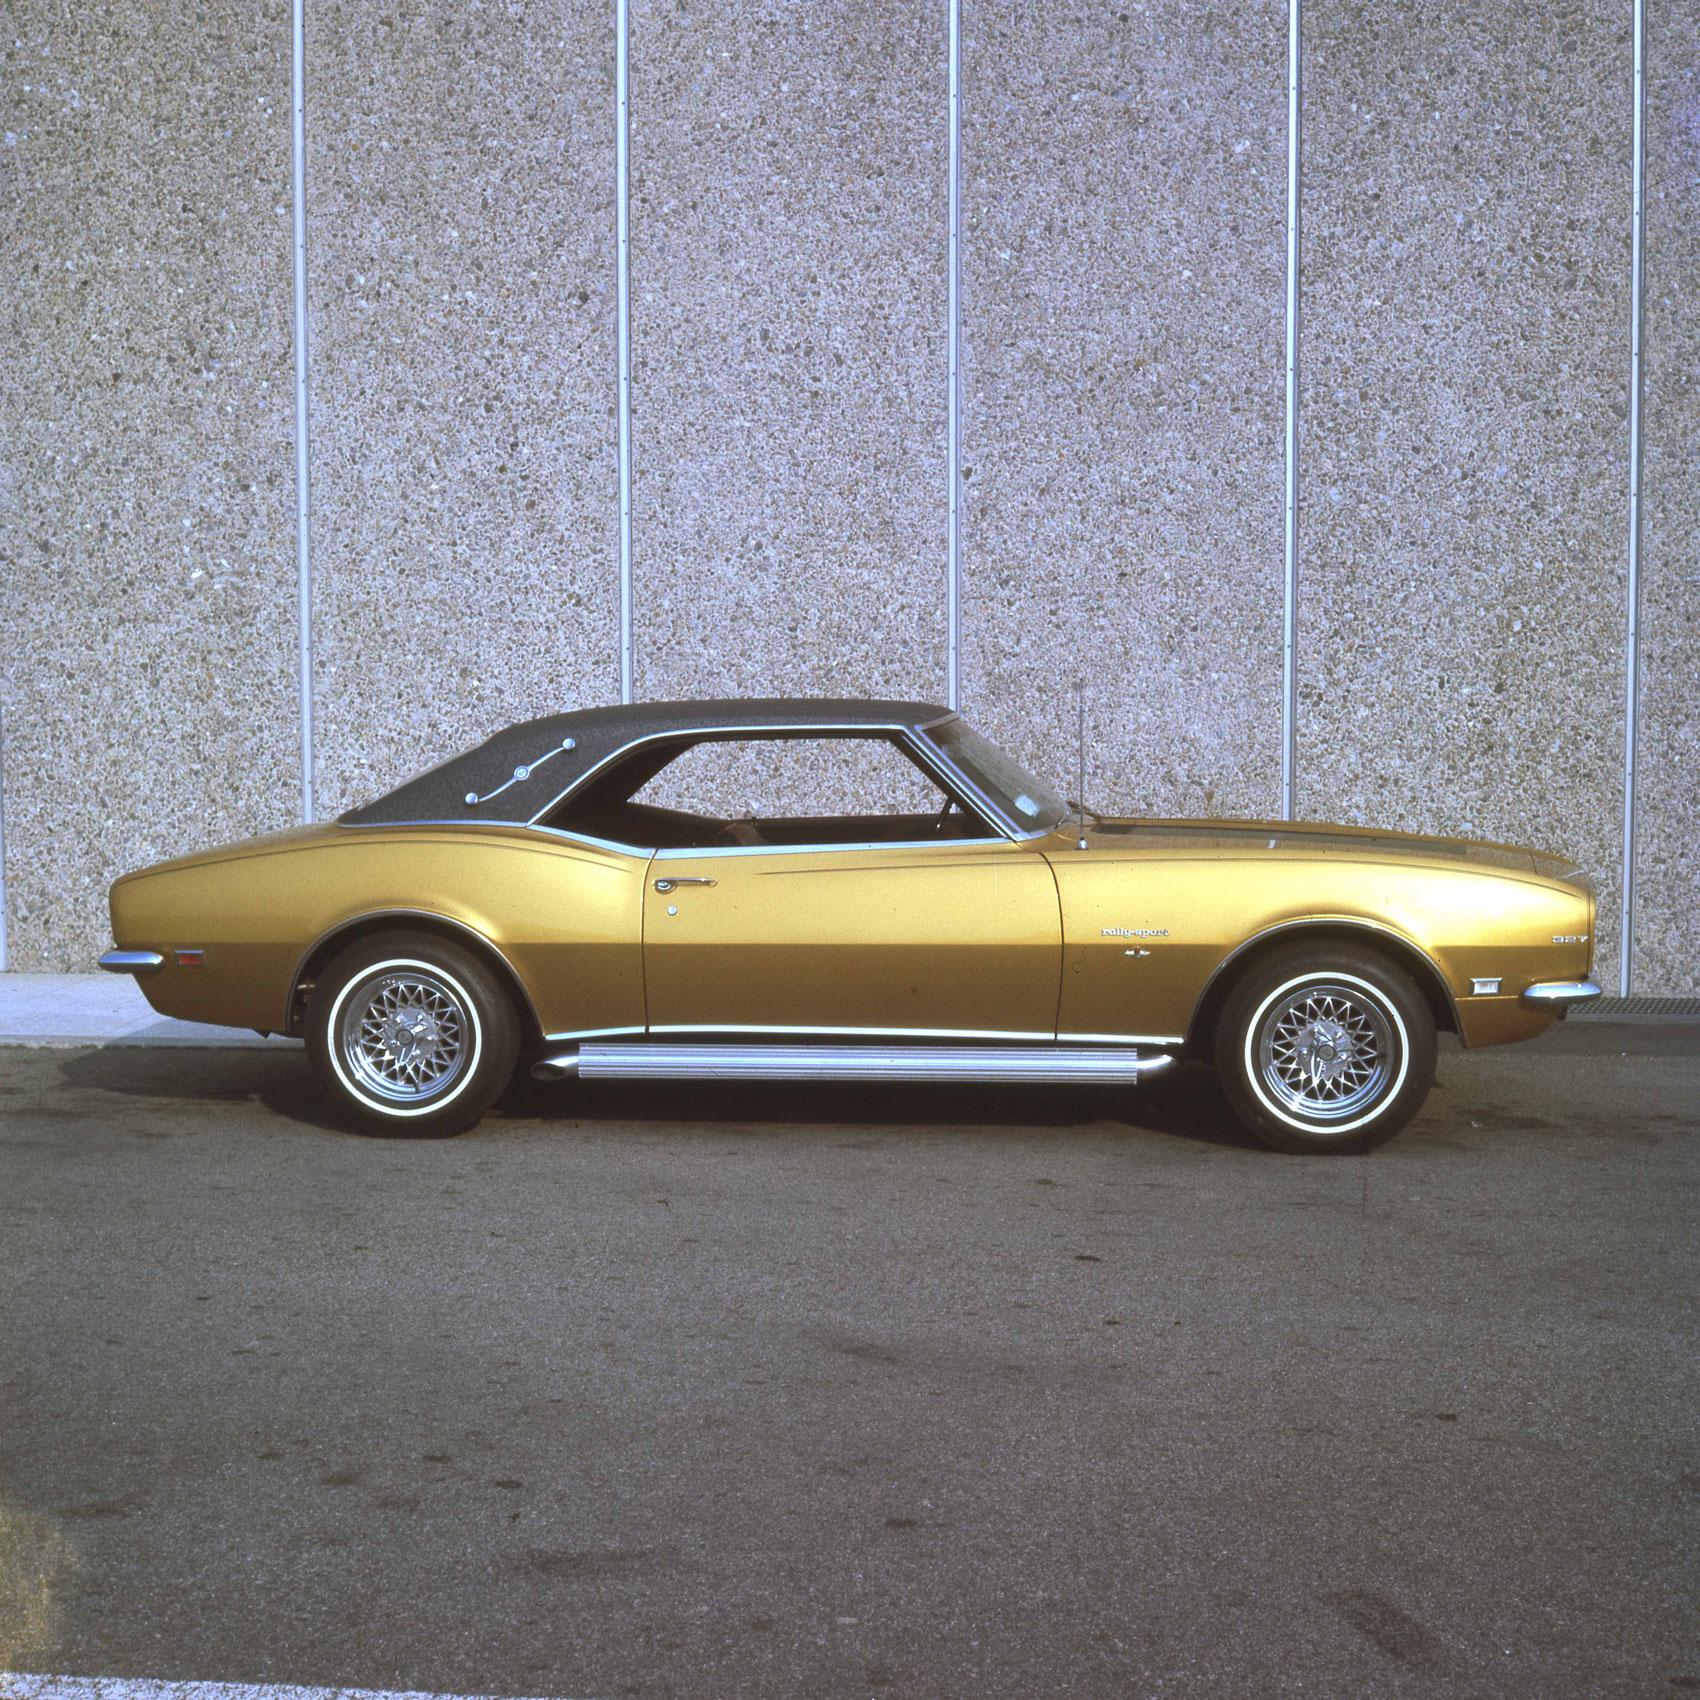 Barris-Gold-Camaro.jpg